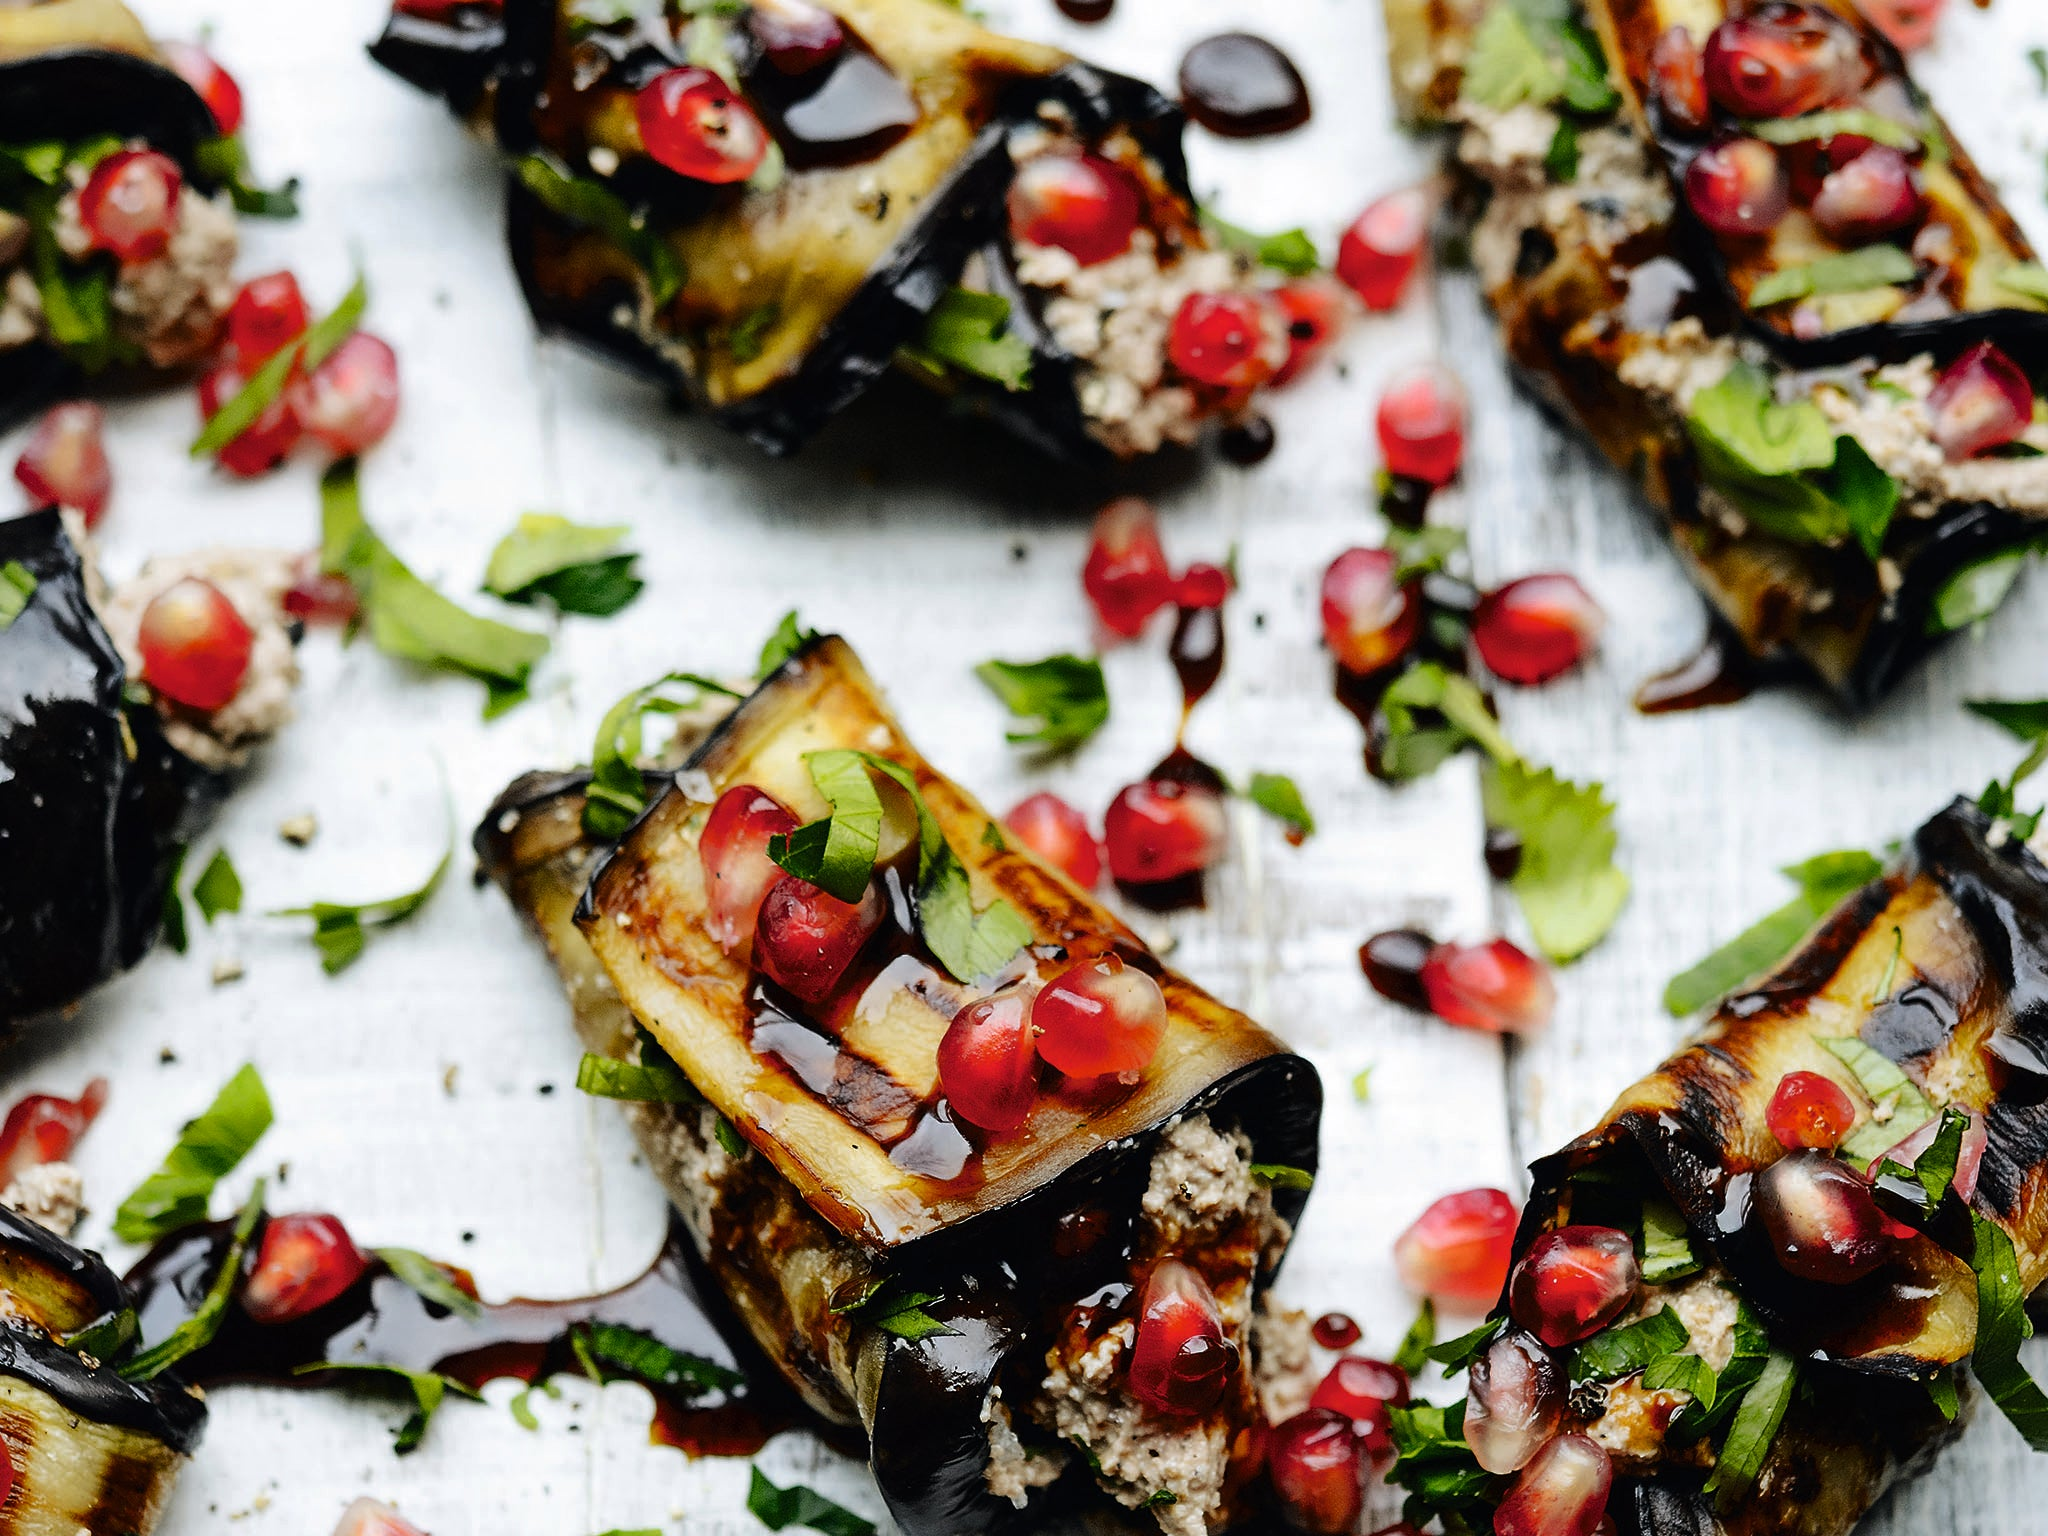 Charred cookbook: Vegetarian BBQ recipes from Georgian-style aubergine rolls to sweet potato and quinoa rosti